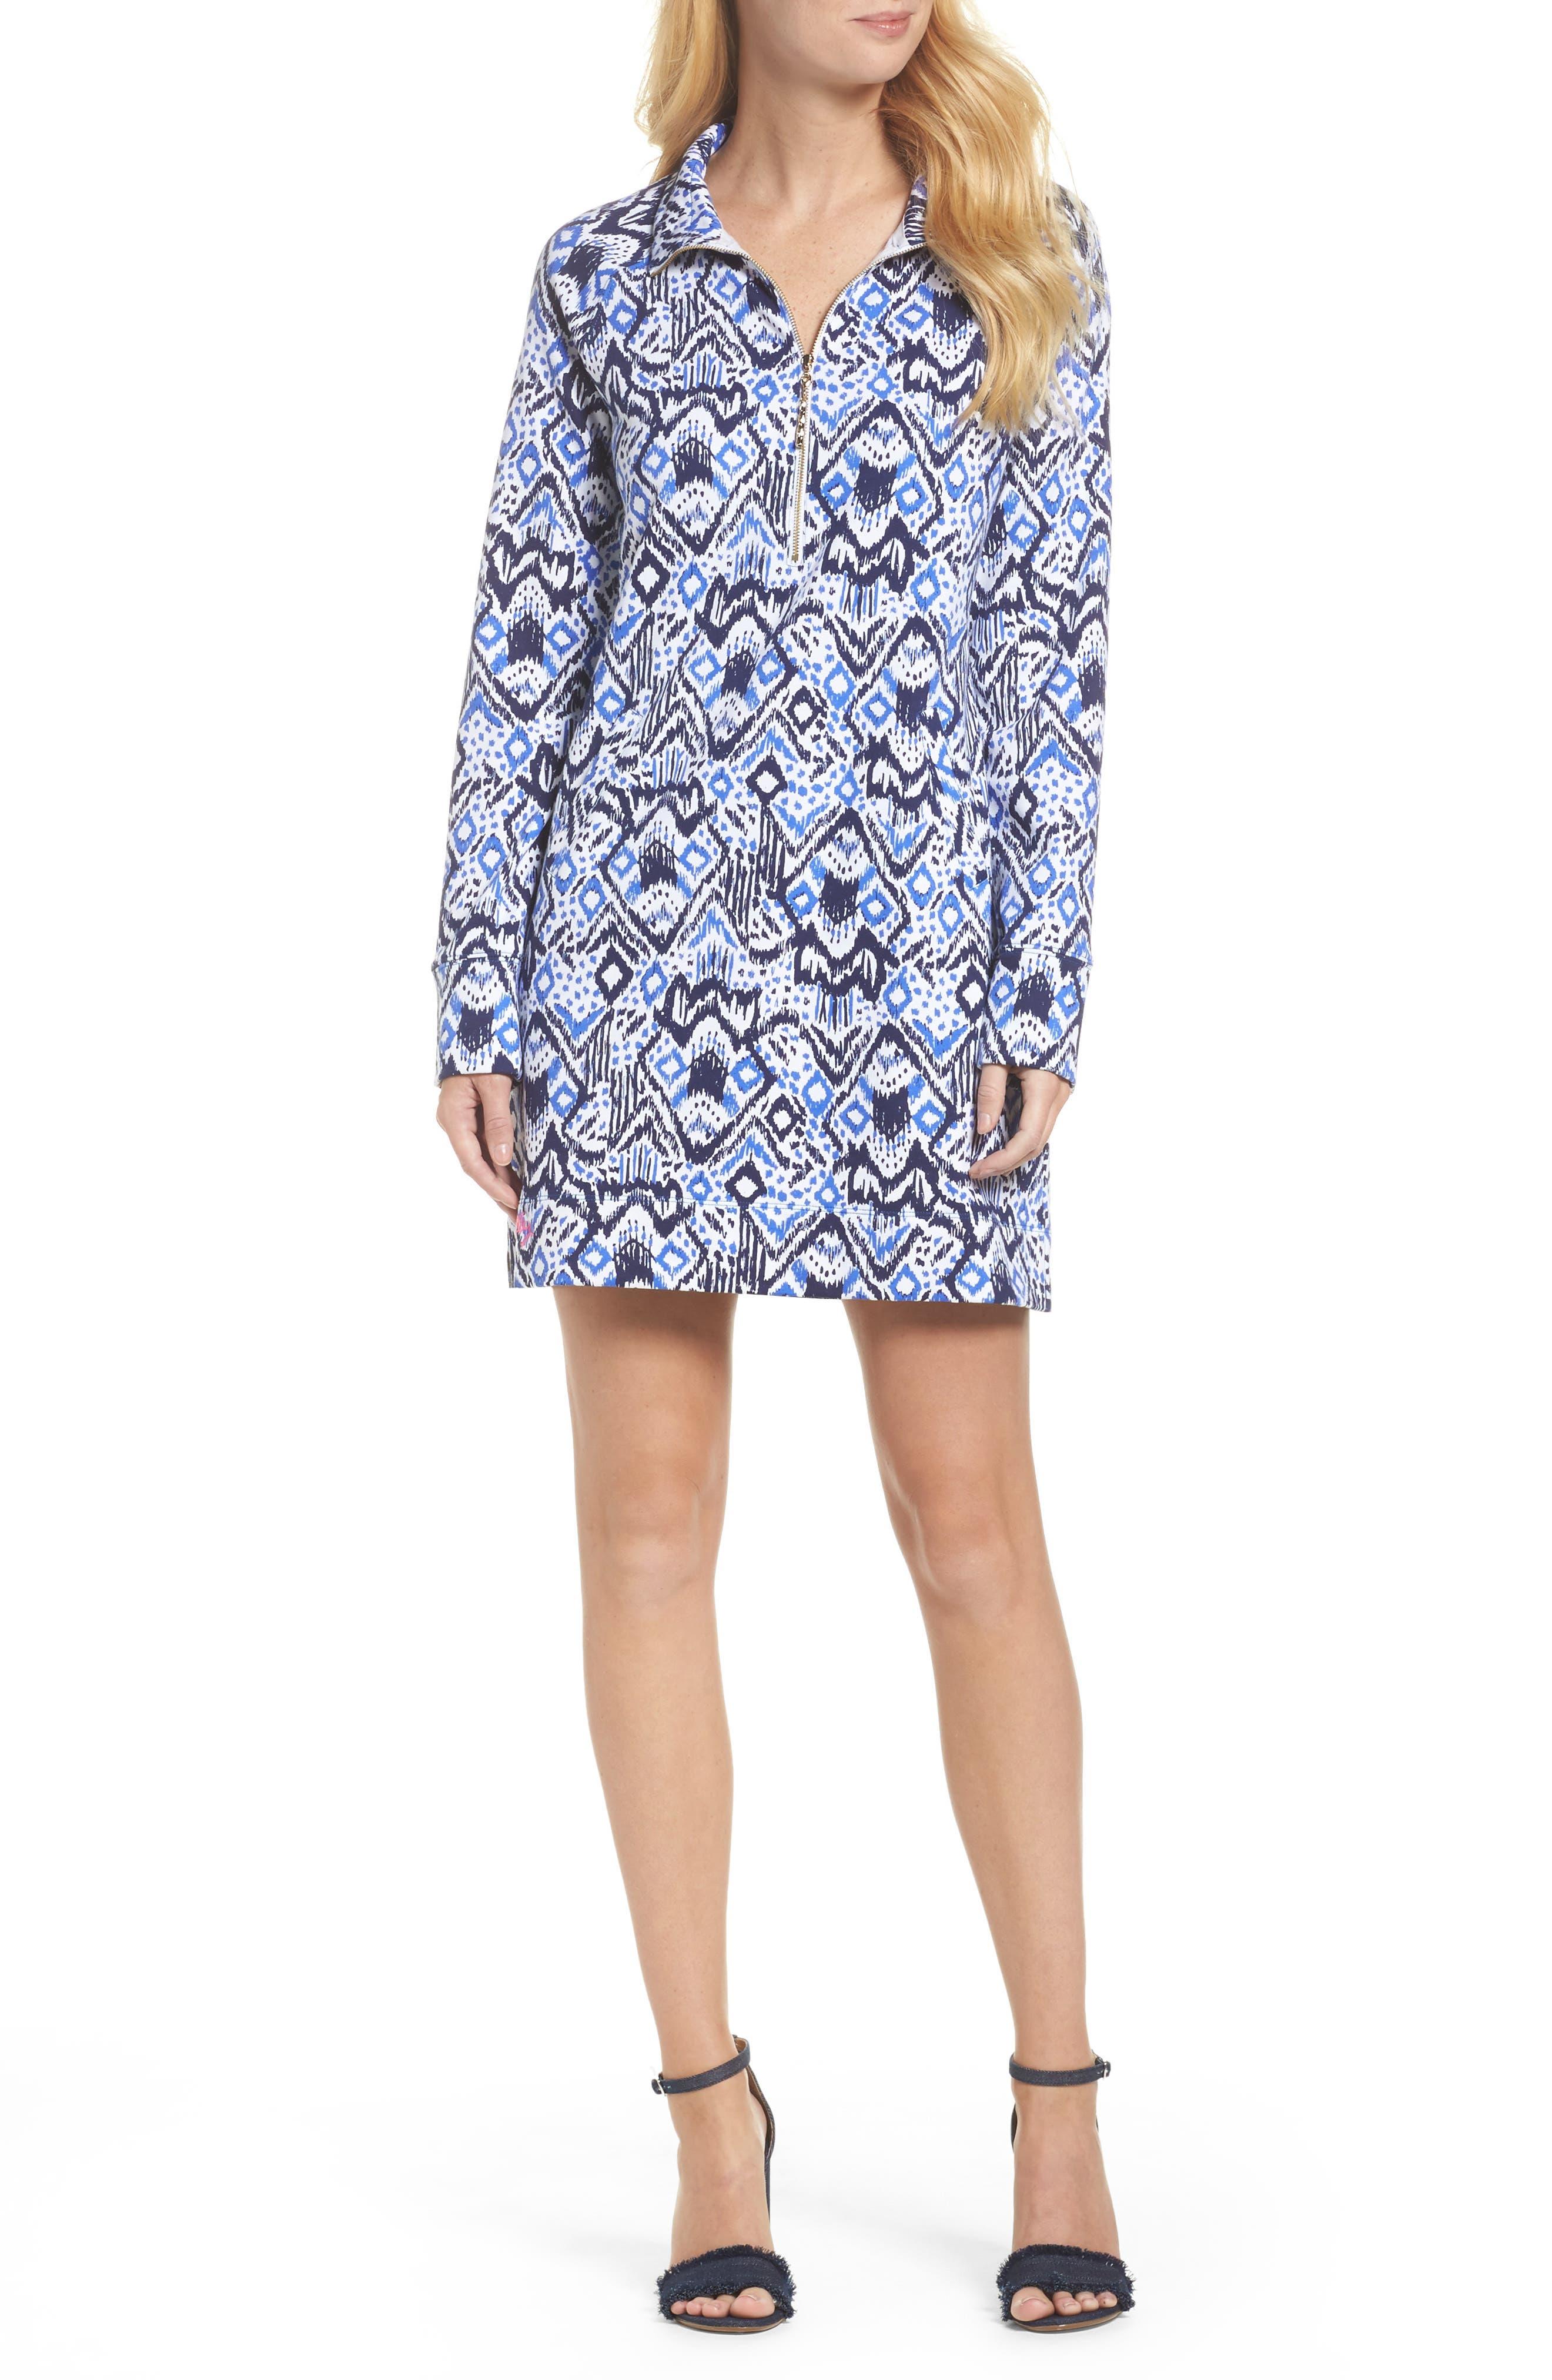 Main Image - Lilly Pulitzer® Skipper UPF 50+ Dress